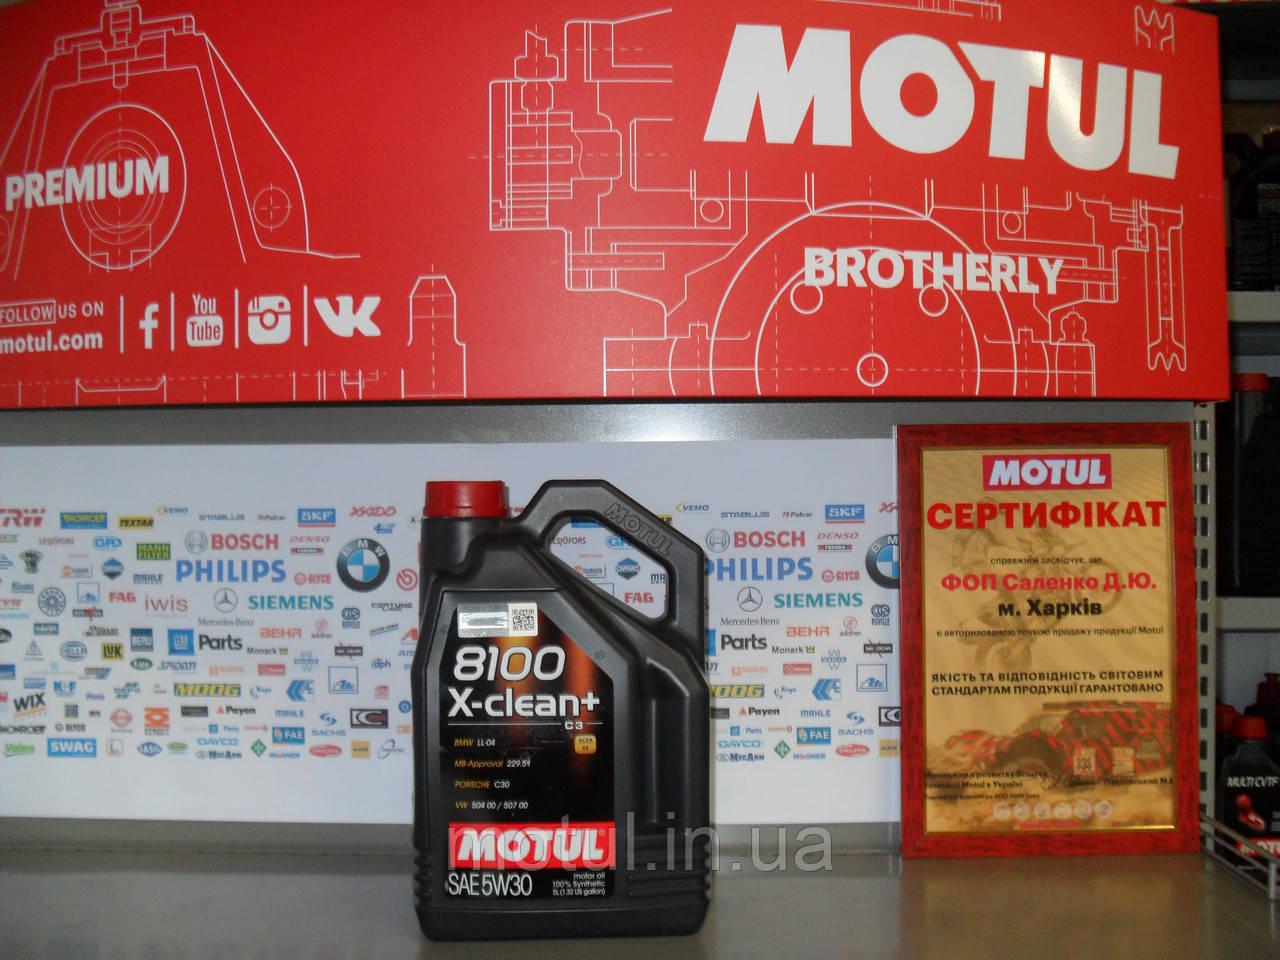 Моторное масло Motul x-clean+ 5w30 5л